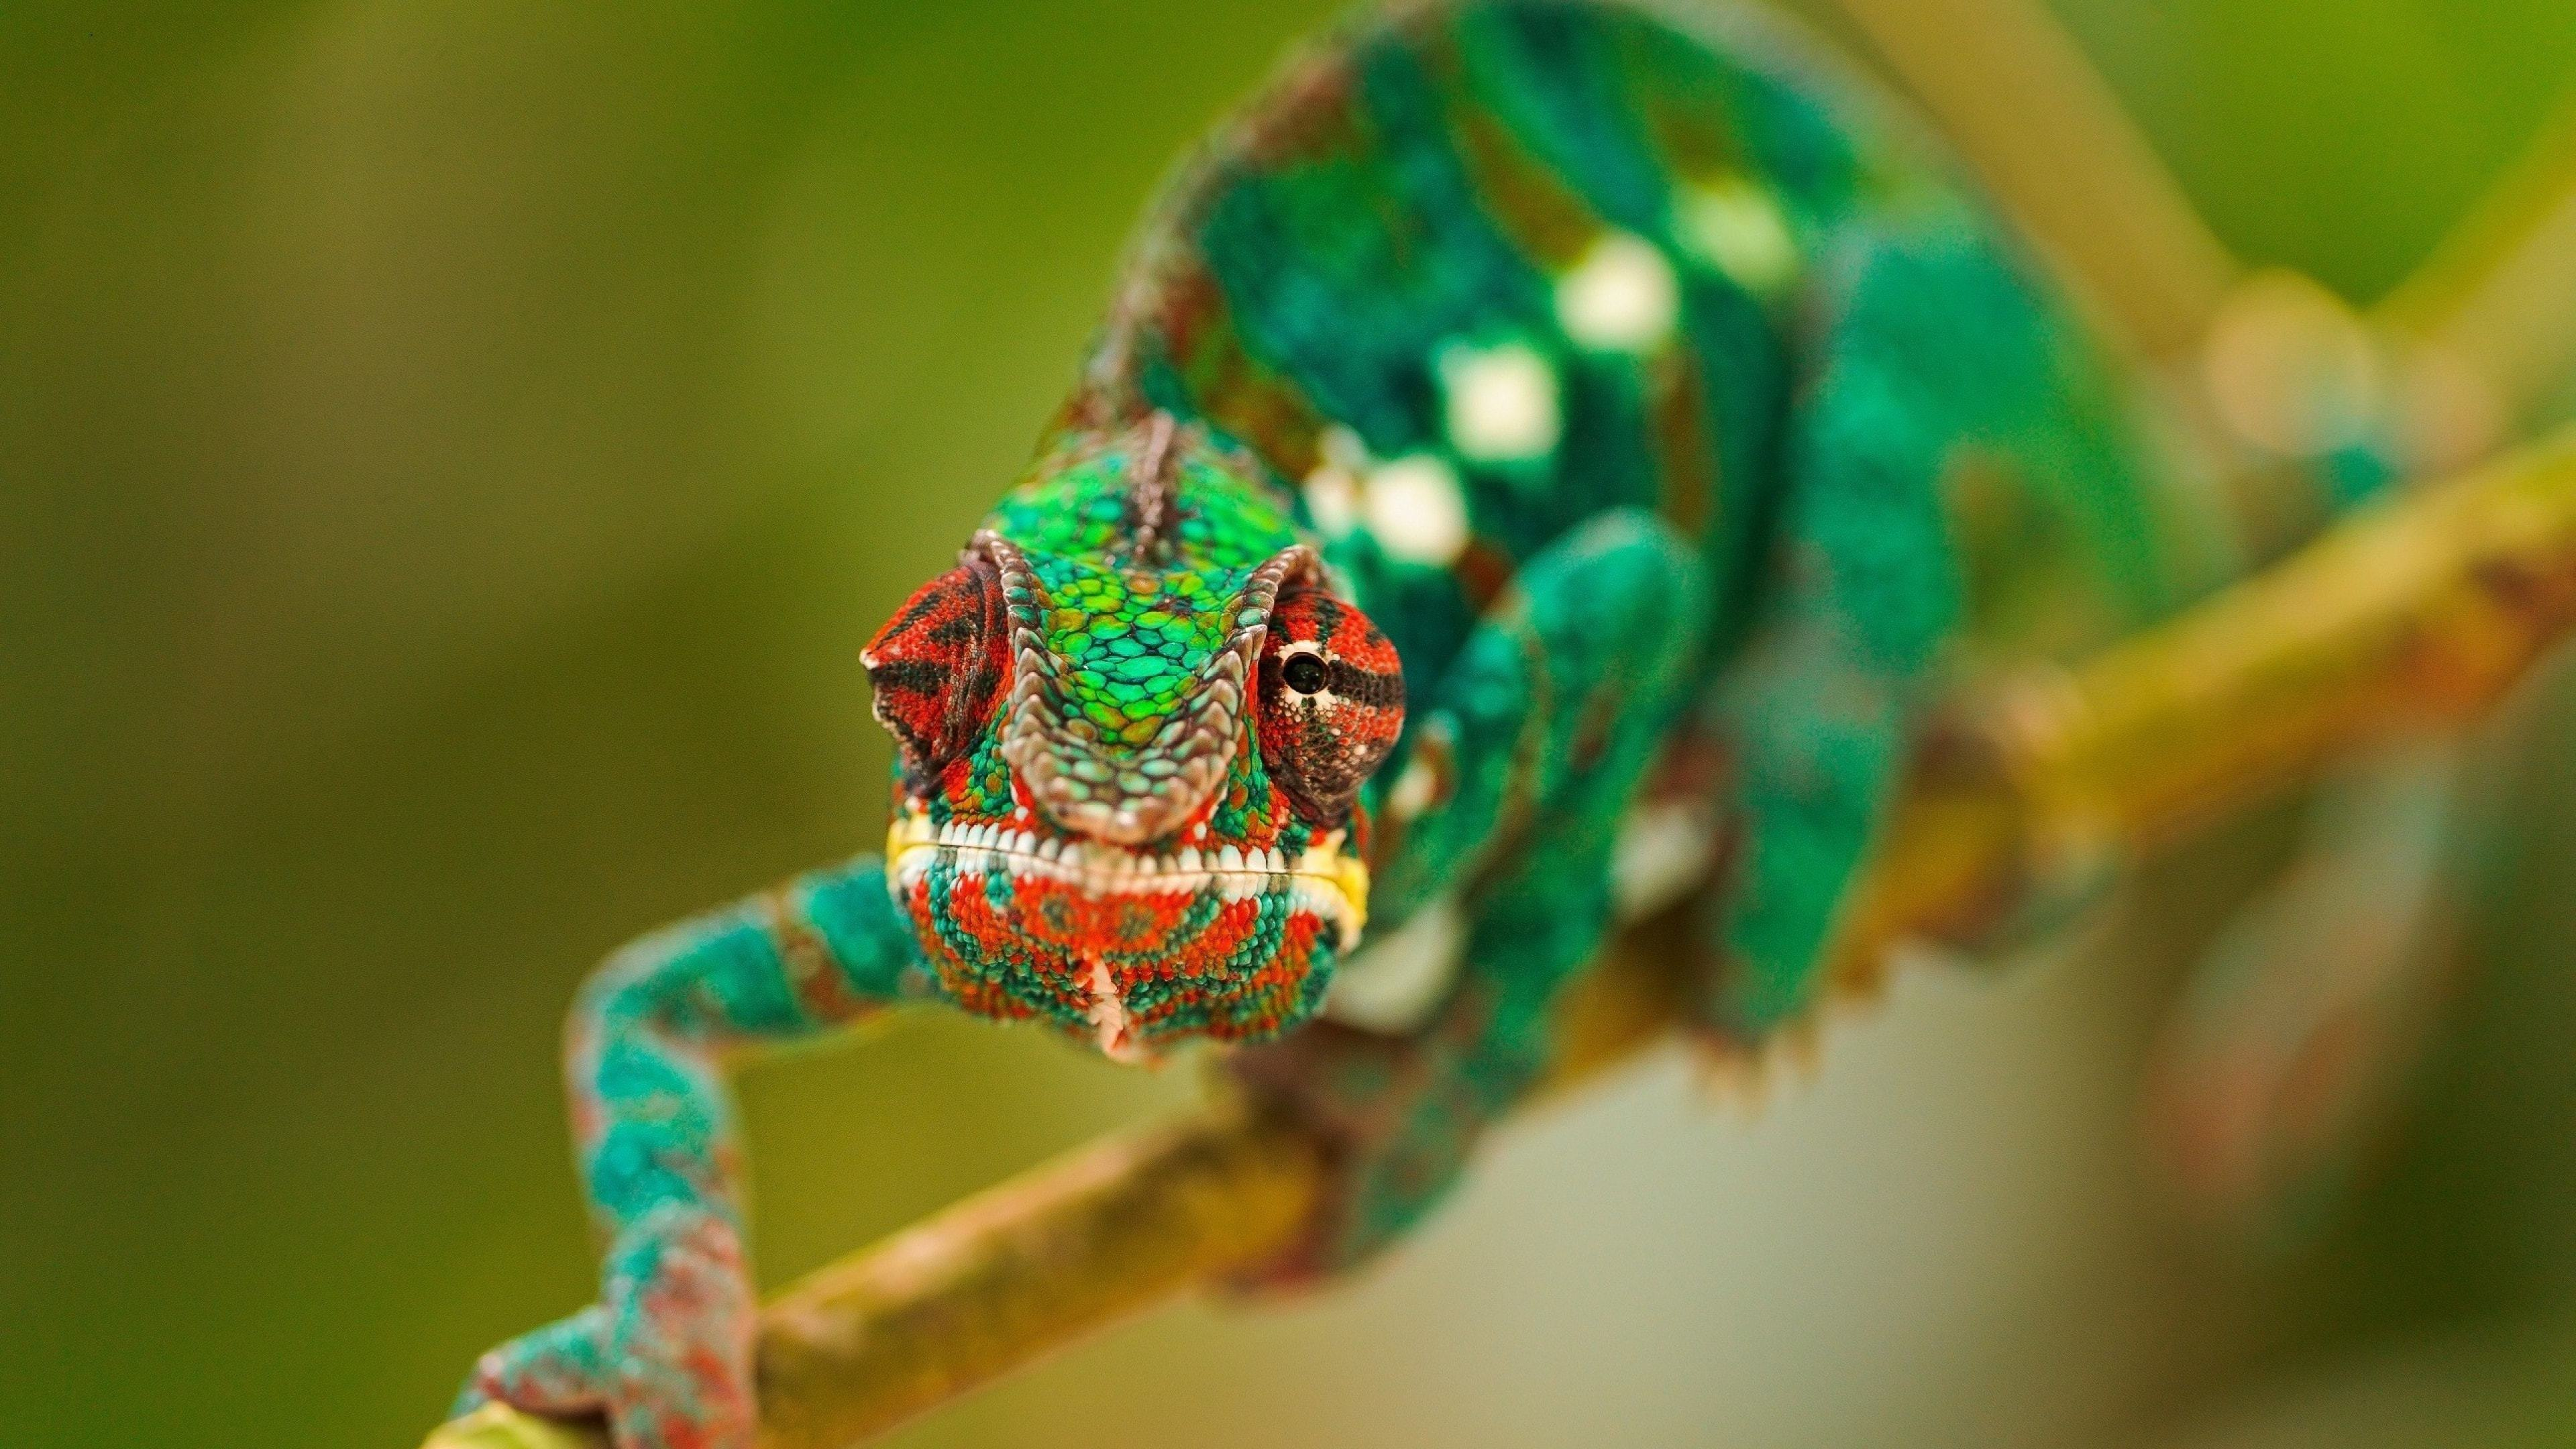 Chameleon Widescreen